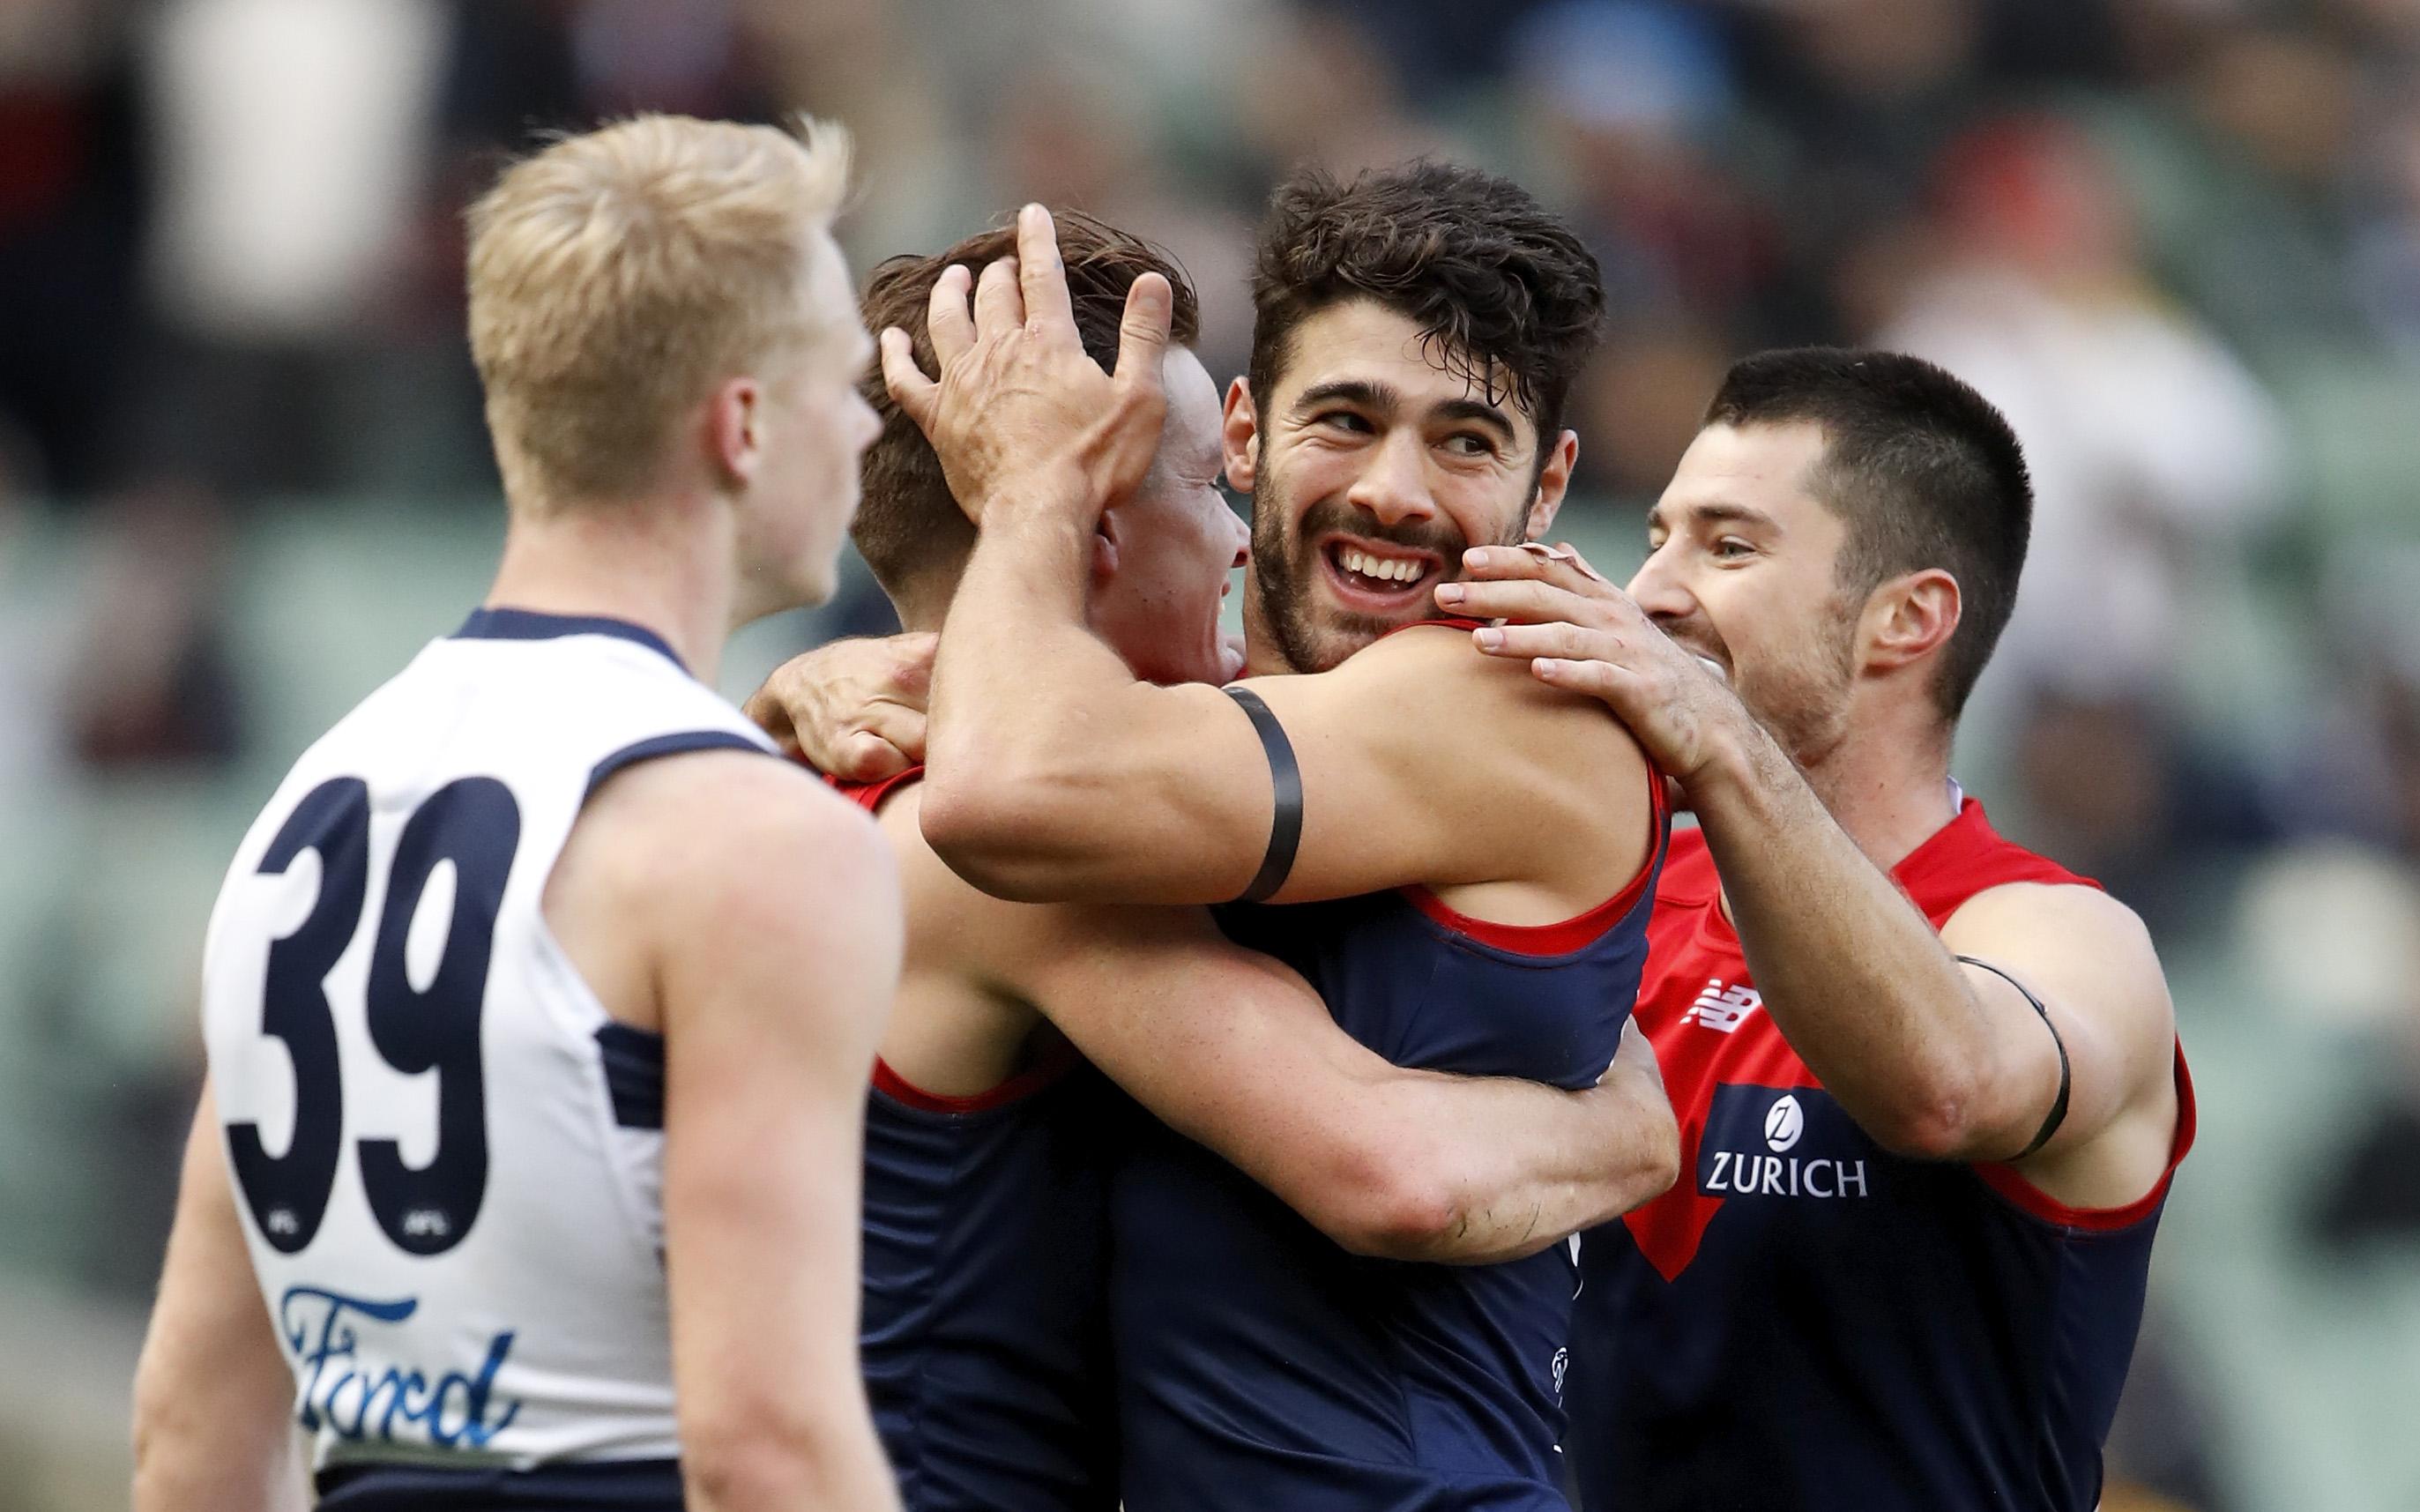 Demons extend unbeaten start with convincing win over Cats